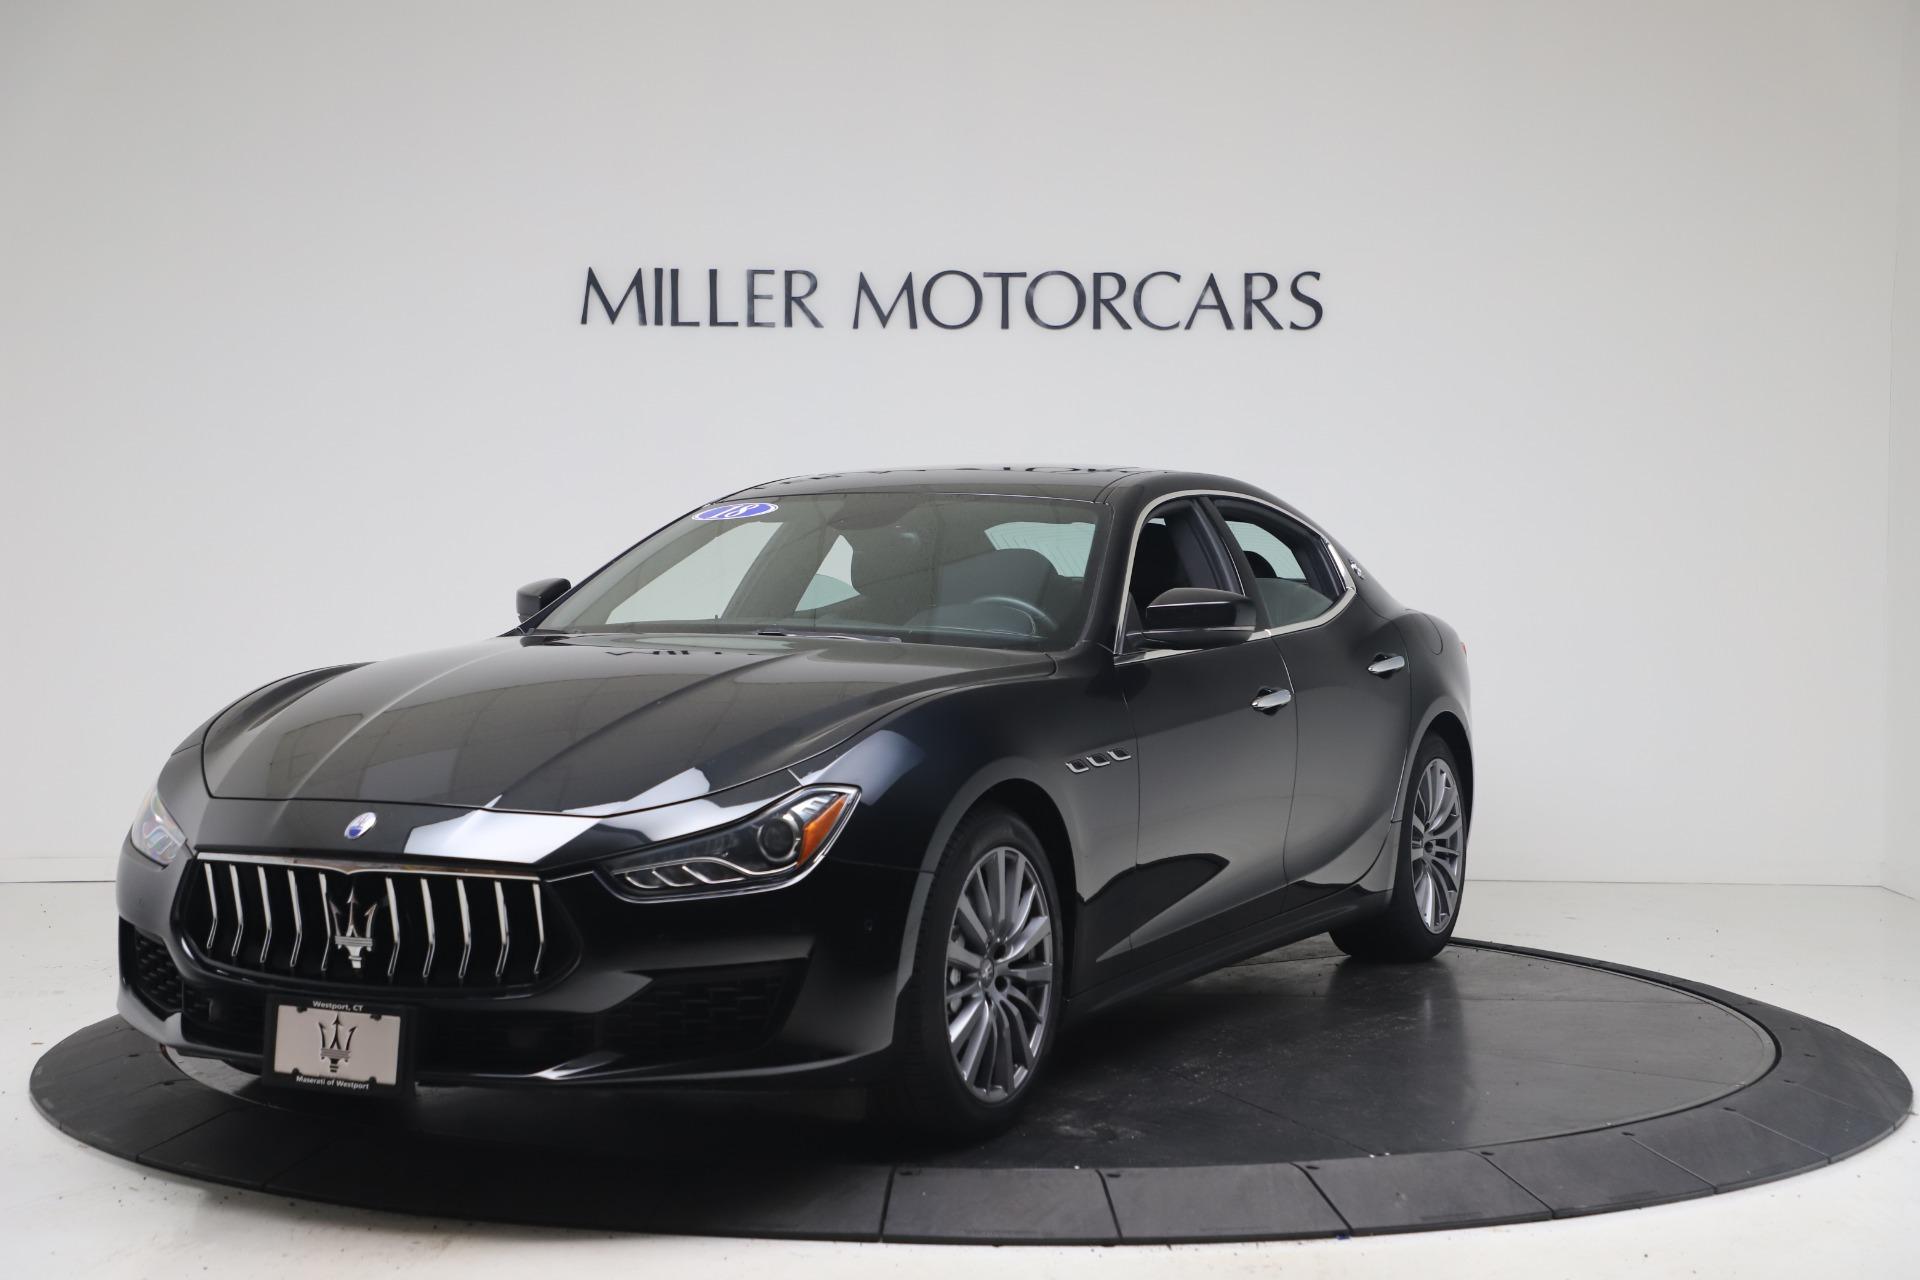 Used 2018 Maserati Ghibli SQ4 for sale $54,900 at Maserati of Greenwich in Greenwich CT 06830 1